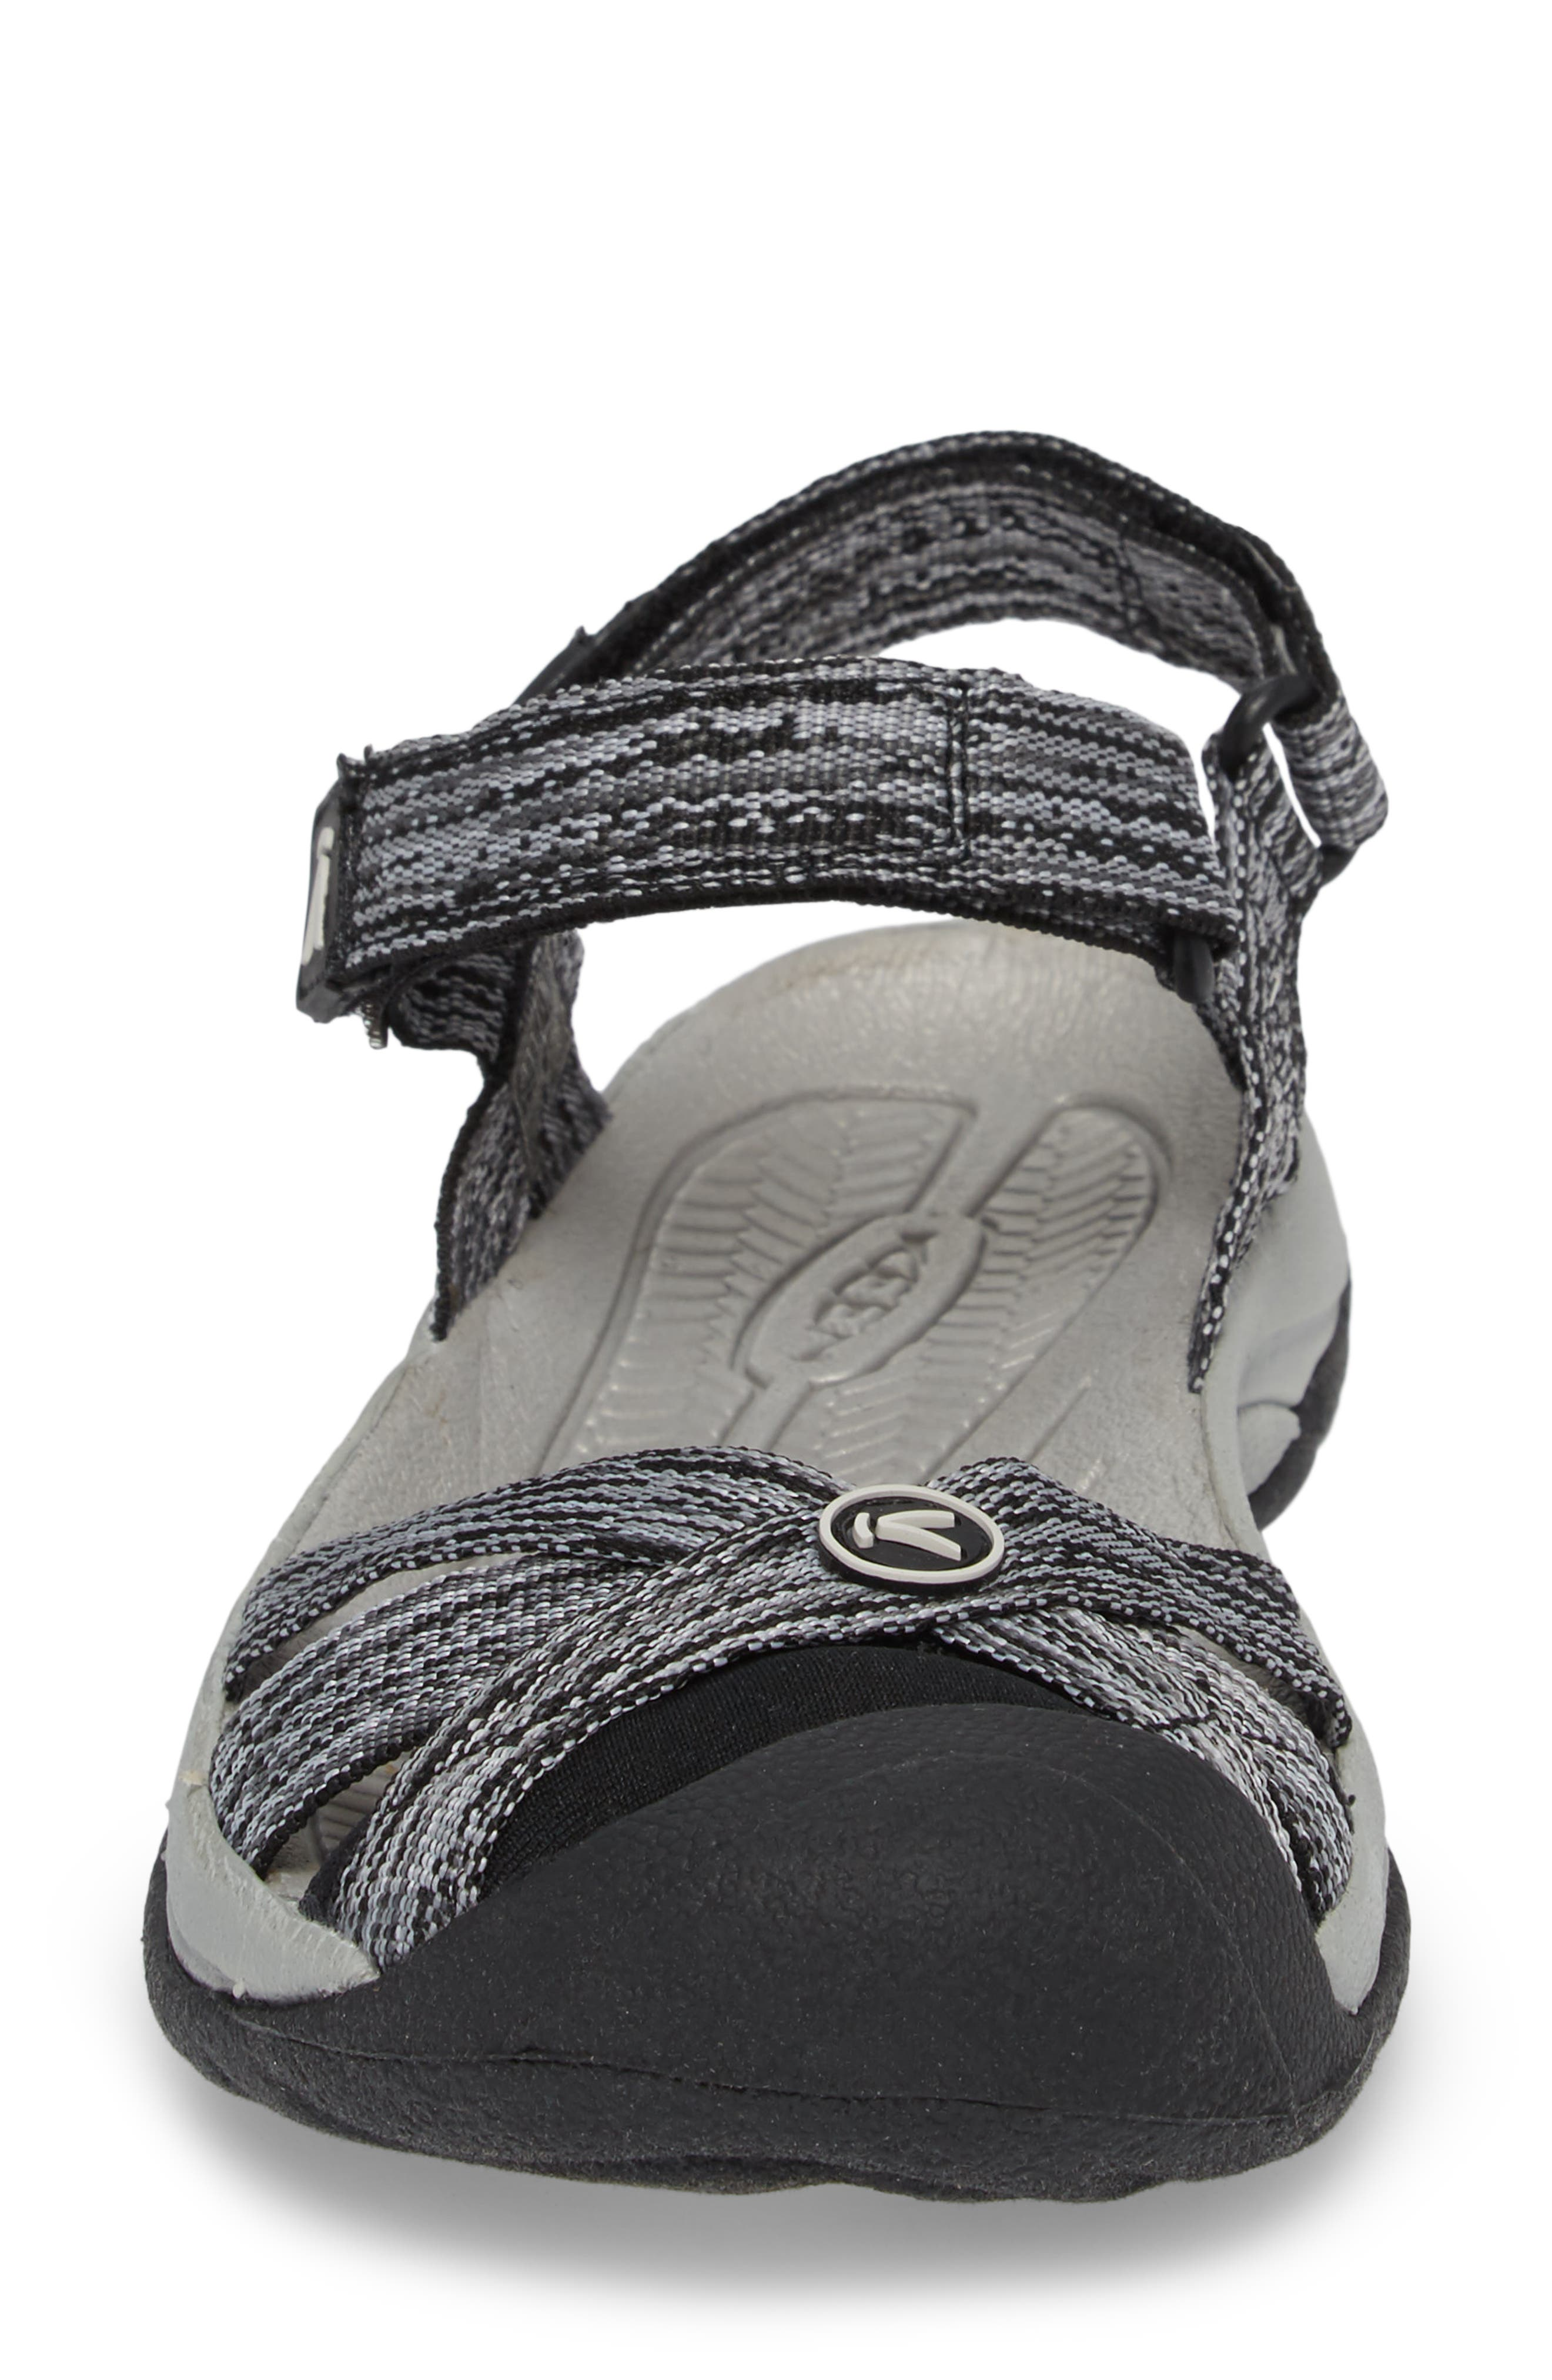 Bali Sandal,                             Alternate thumbnail 4, color,                             NEUTRAL GRAY/ BLACK